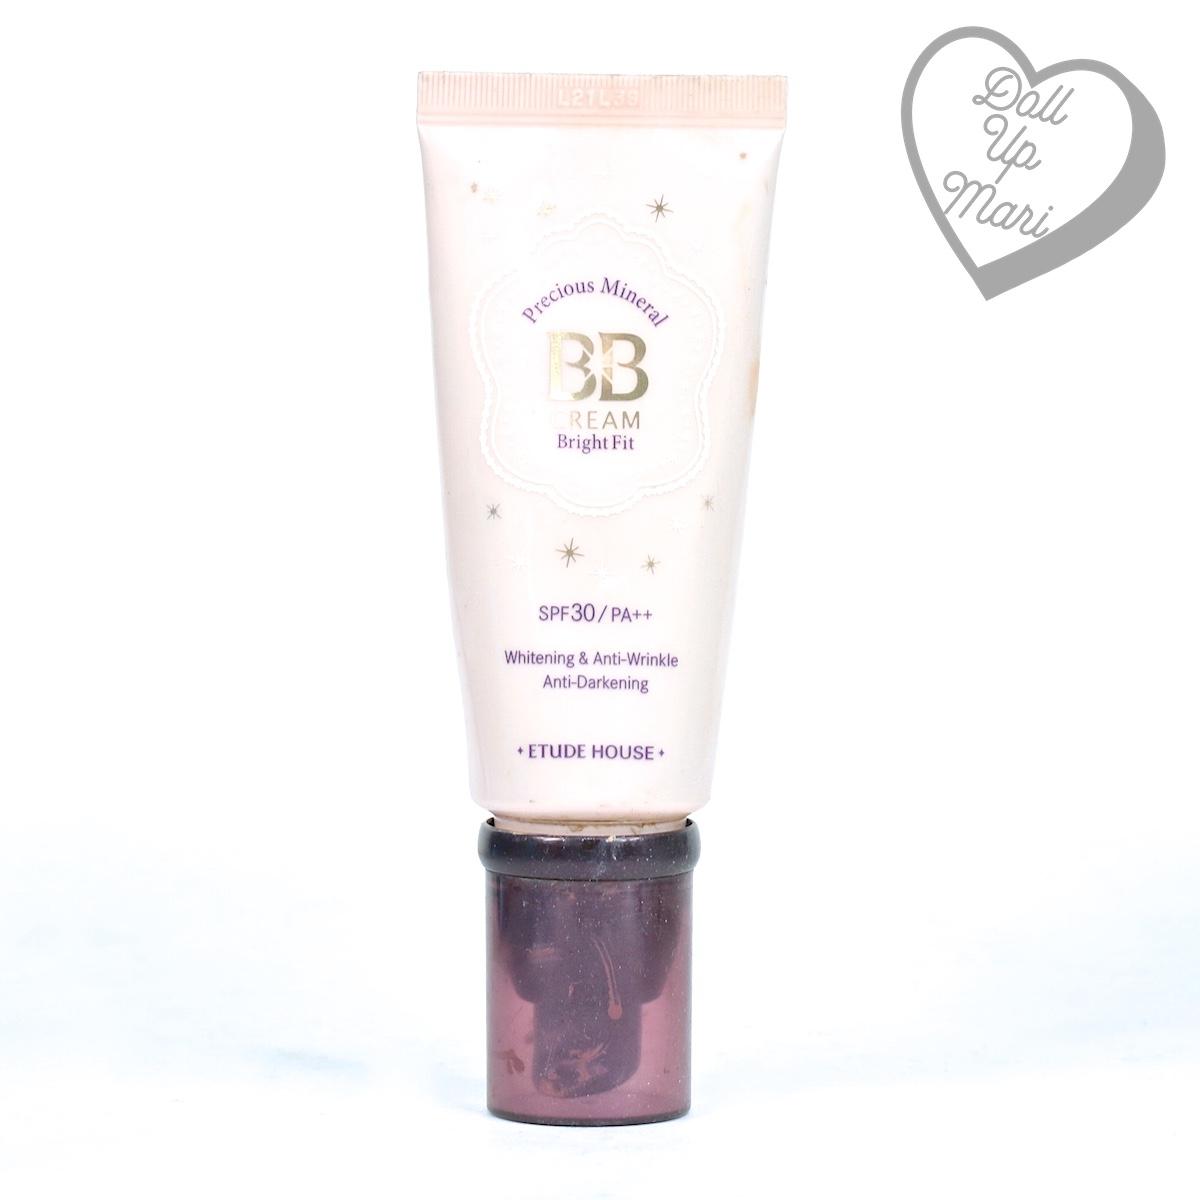 Etude House Precious Mineral BB Cream (Bright Fit)